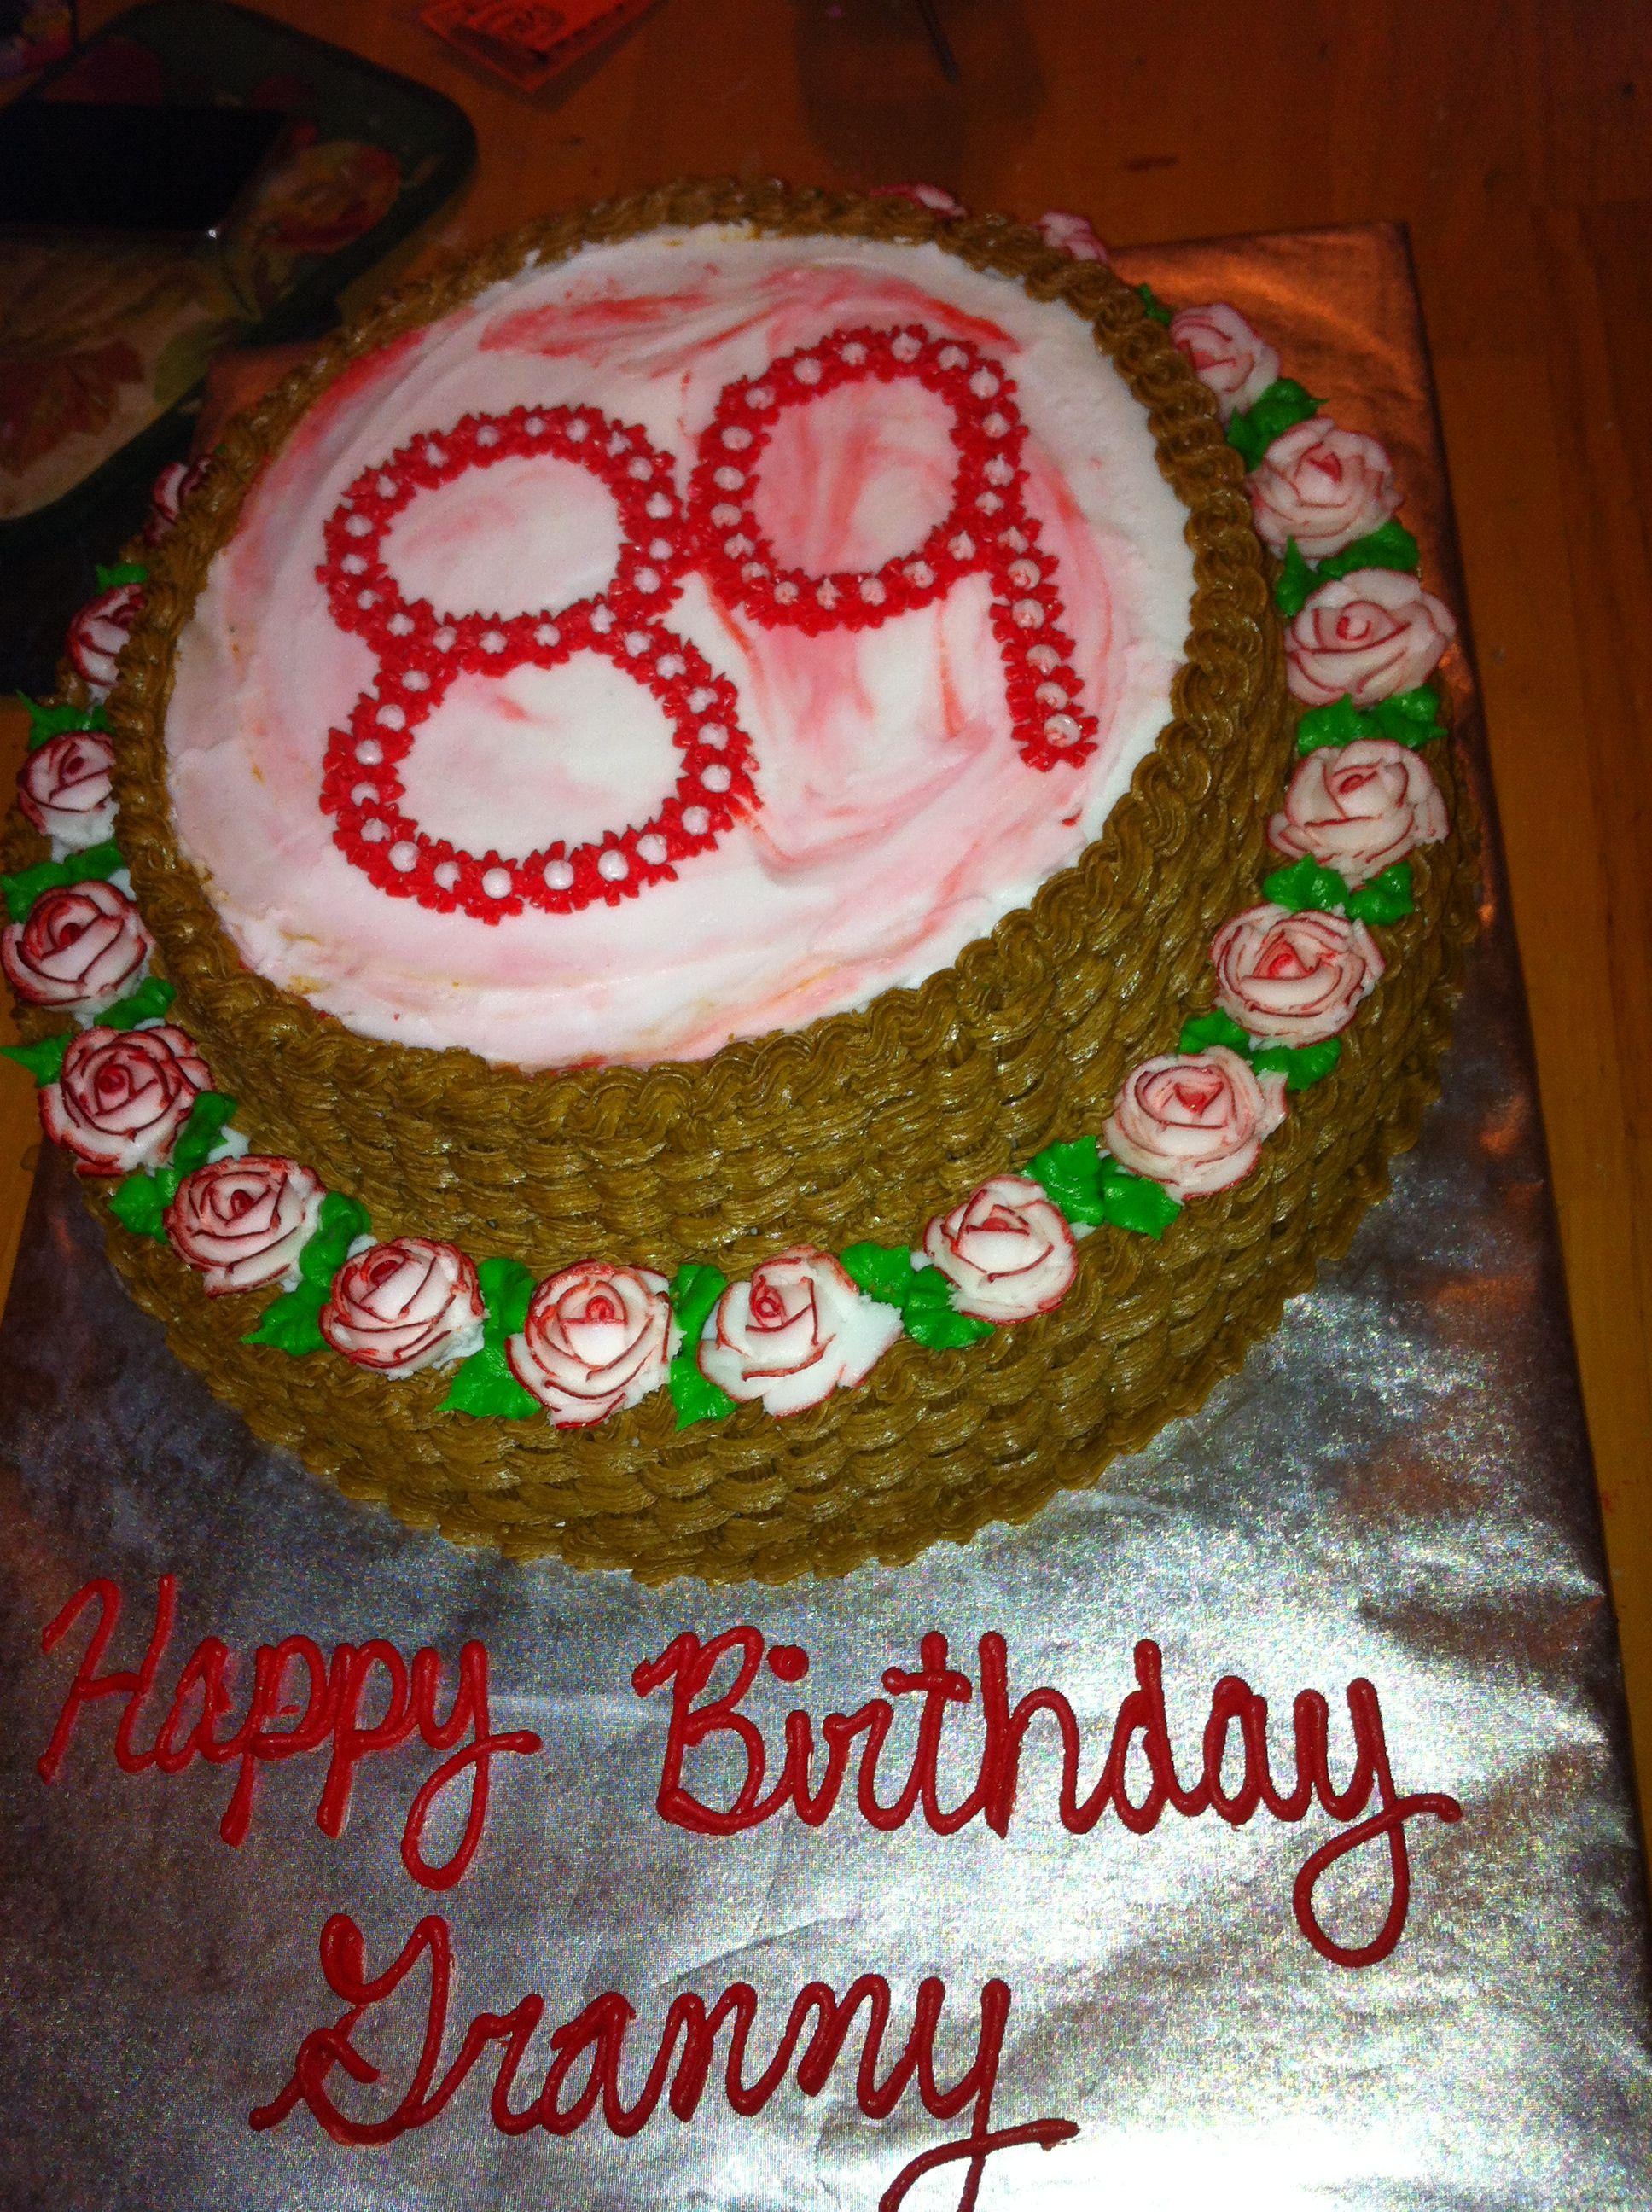 89th Birthday Cake 1031 Cake Decorating Pinterest Birthday